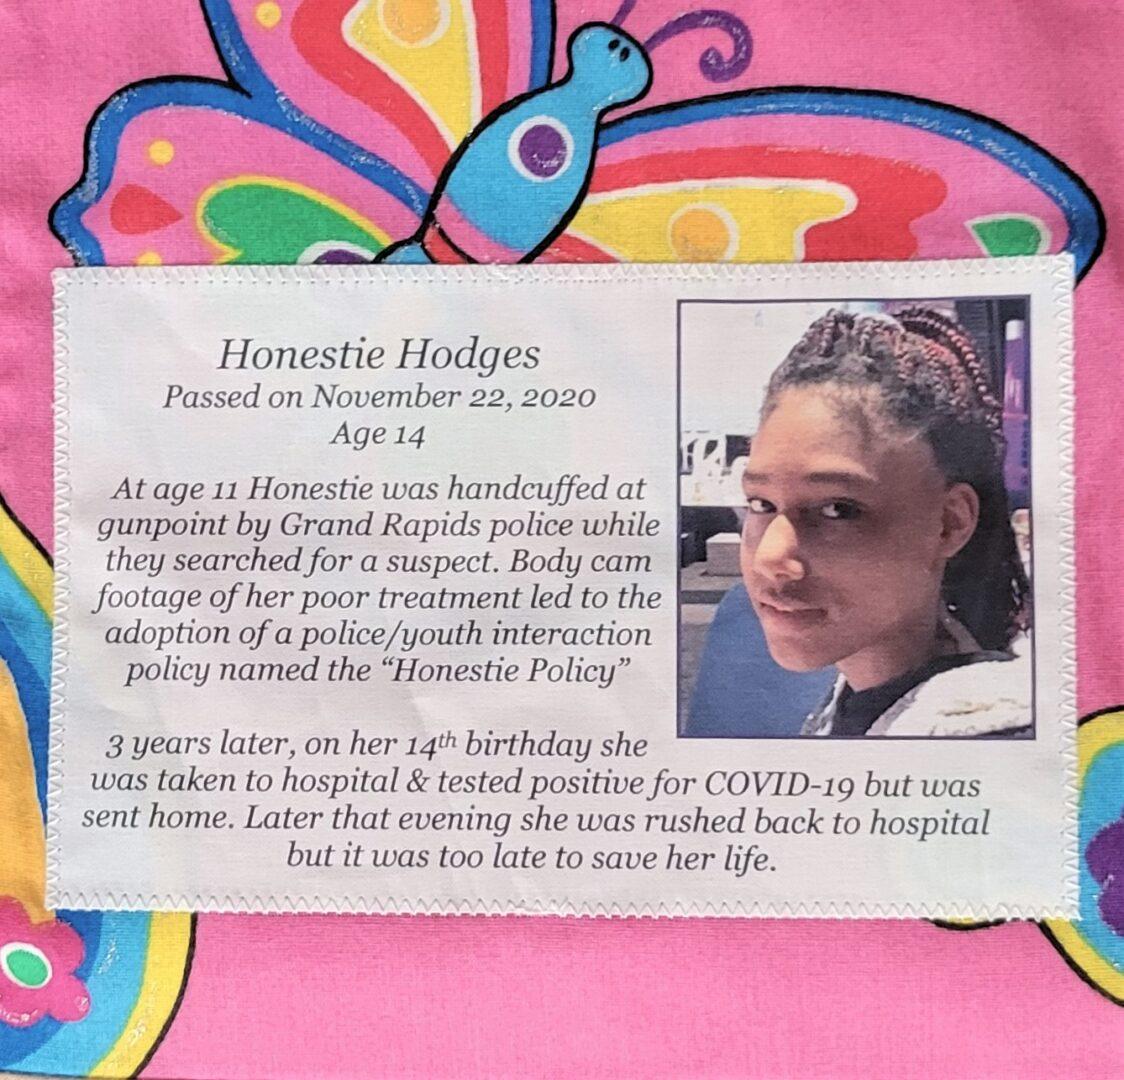 IN MEMORY OF HONESTIE HODGES - NOVEMBER 22, 2020, age 14